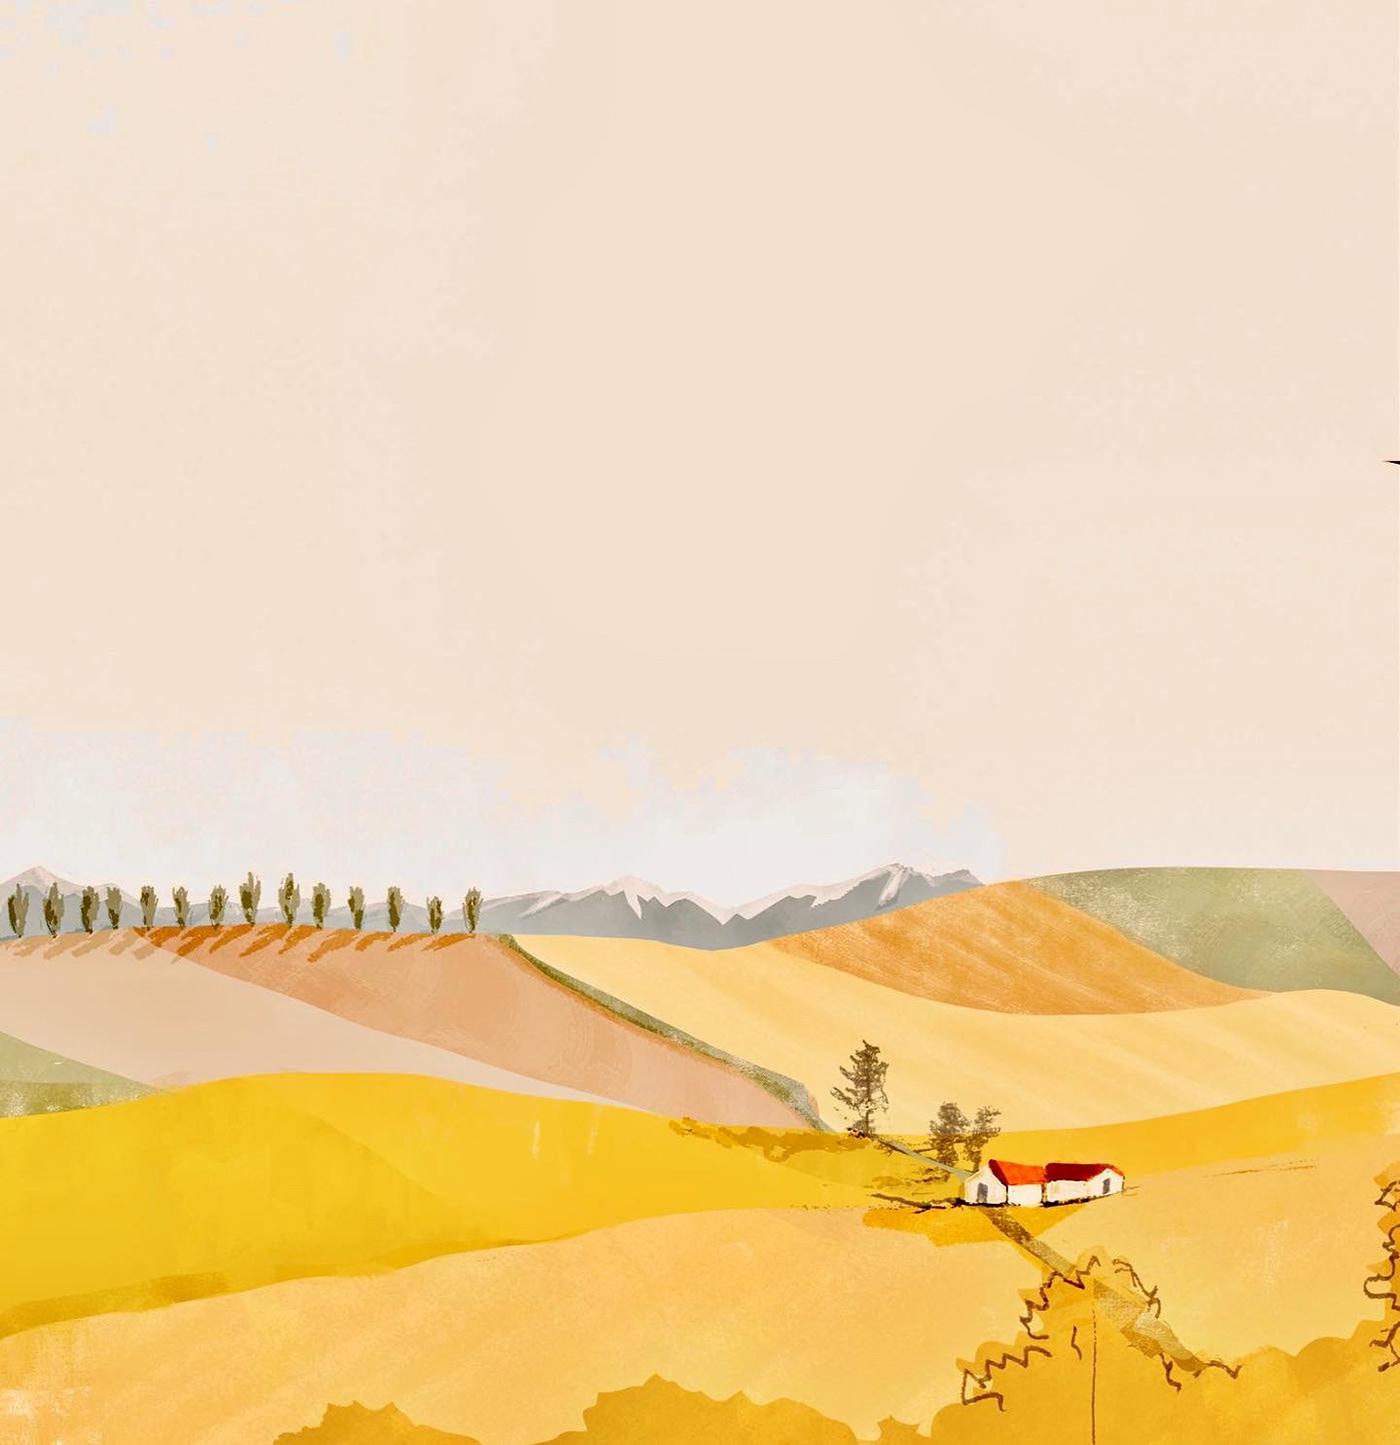 autumn book cover countryside field hills poster SKY children book illustrations Child book ILLUSTRATION  Landscape postcards